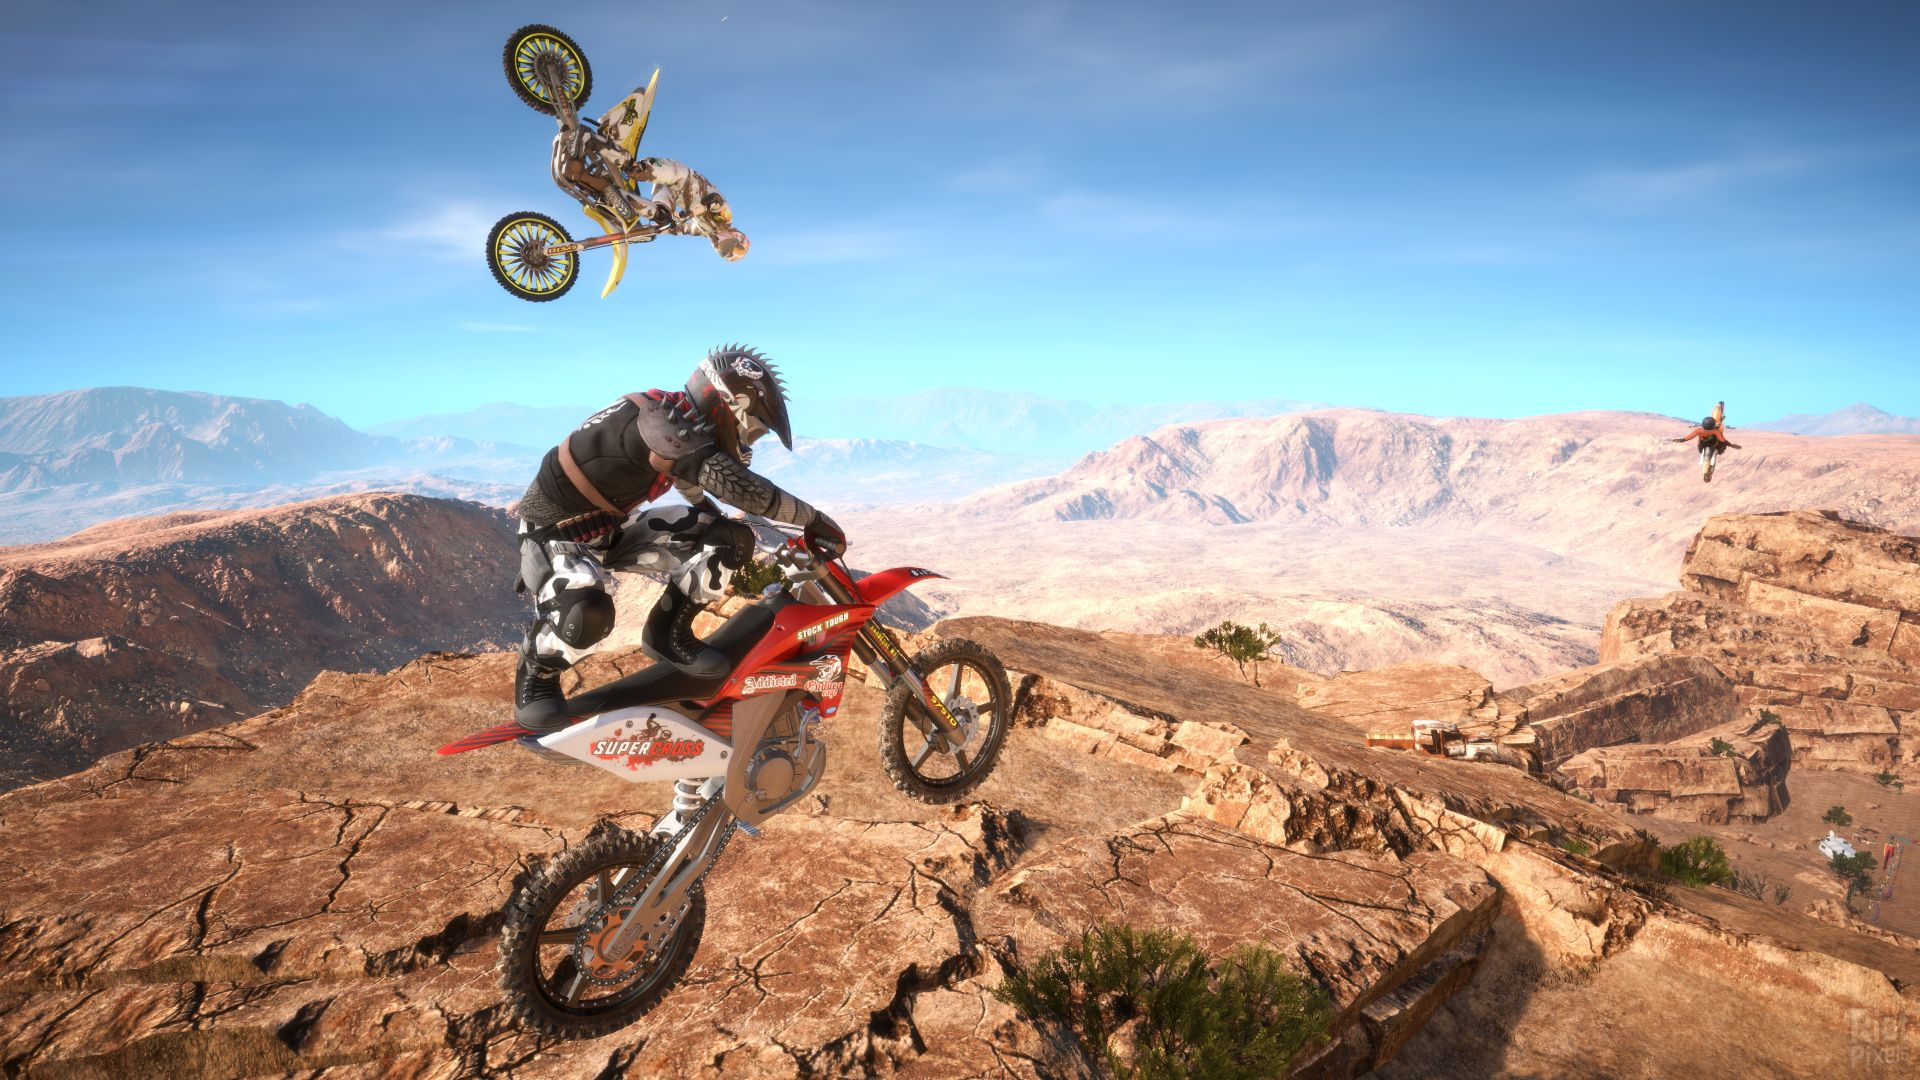 Dirt Bike Wallpaper Girls Wallpaper Mx Nitro Motocross Extreme Pc Xbox One Ps4